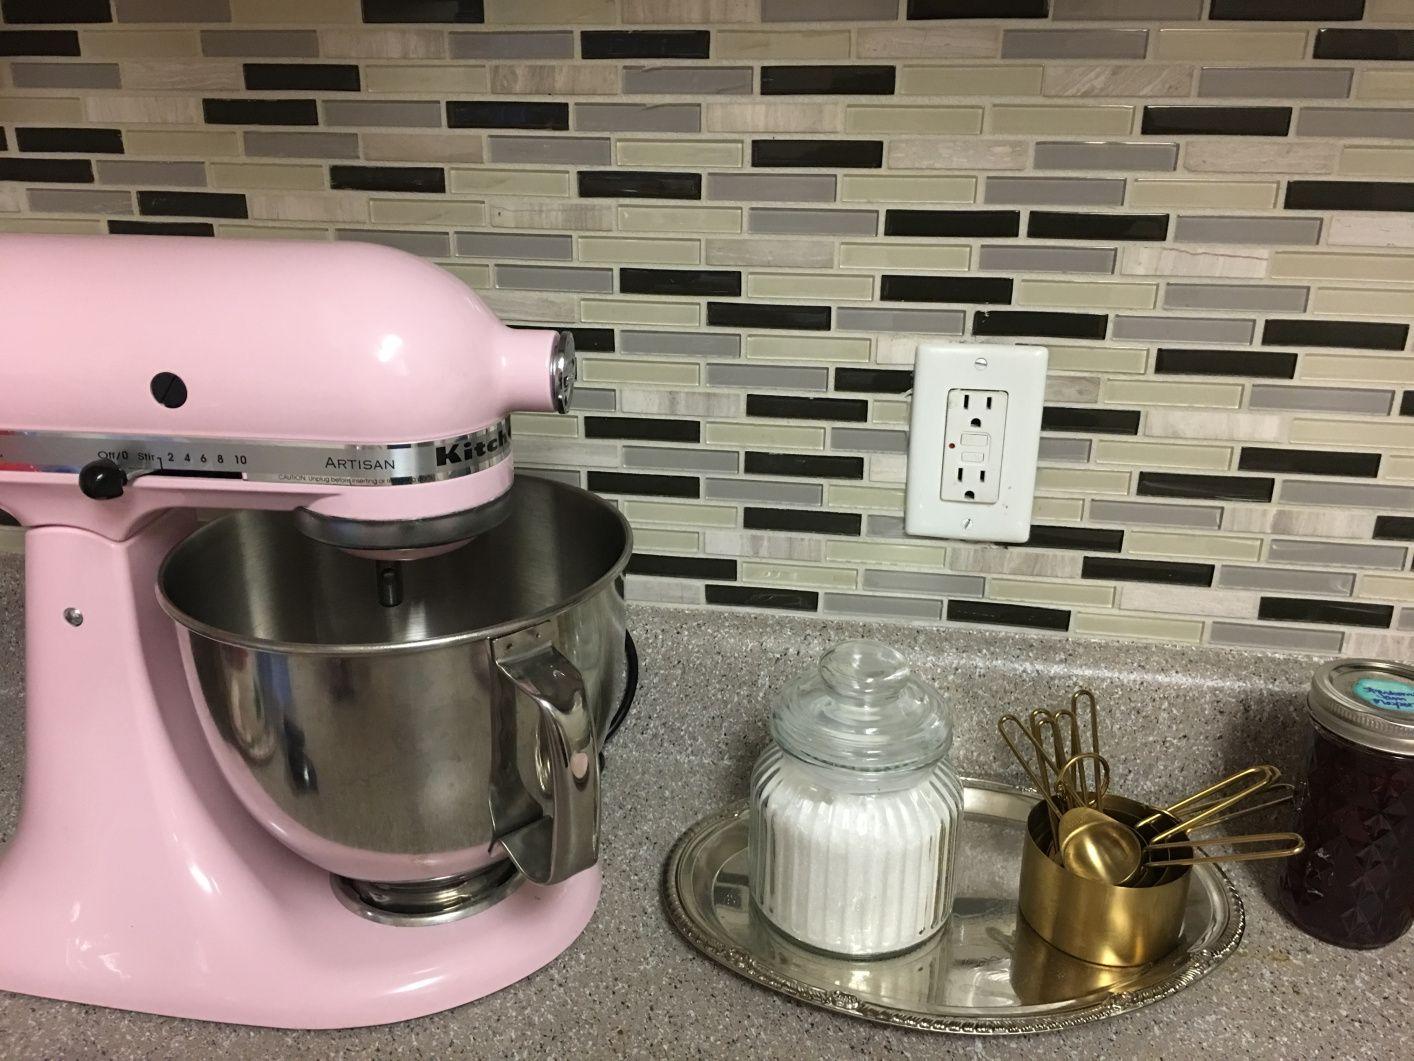 kitchenaid measuring spoons pink